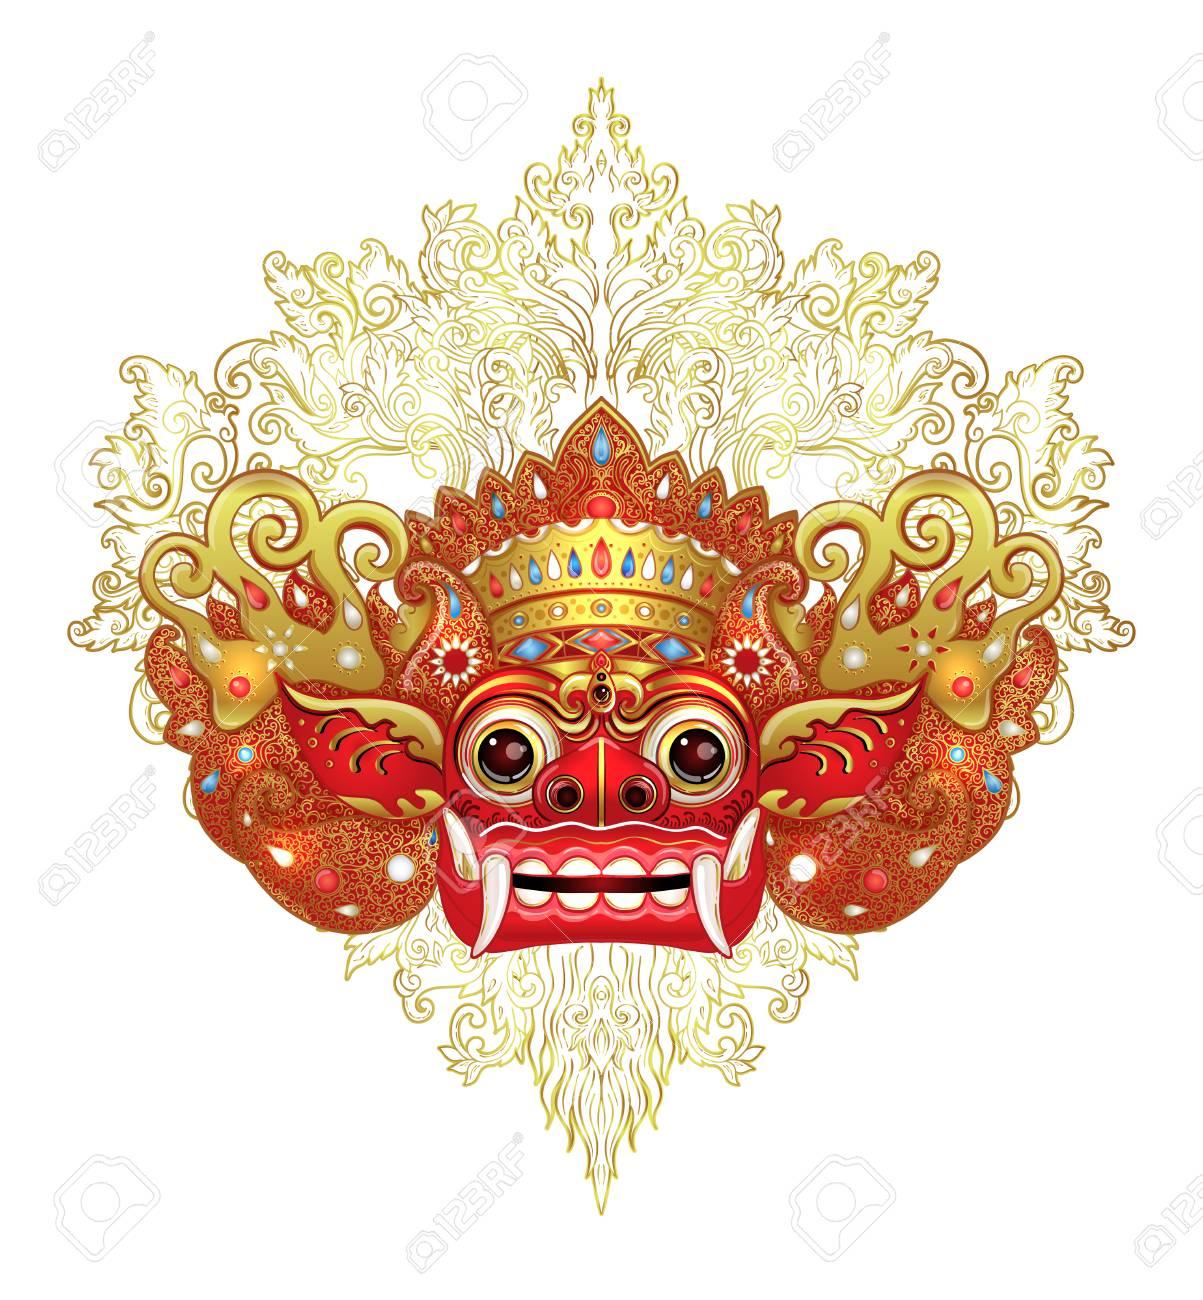 barong traditional ritual balinese mask vector color illustration royalty free cliparts vectors and stock illustration image 99538696 barong traditional ritual balinese mask vector color illustration